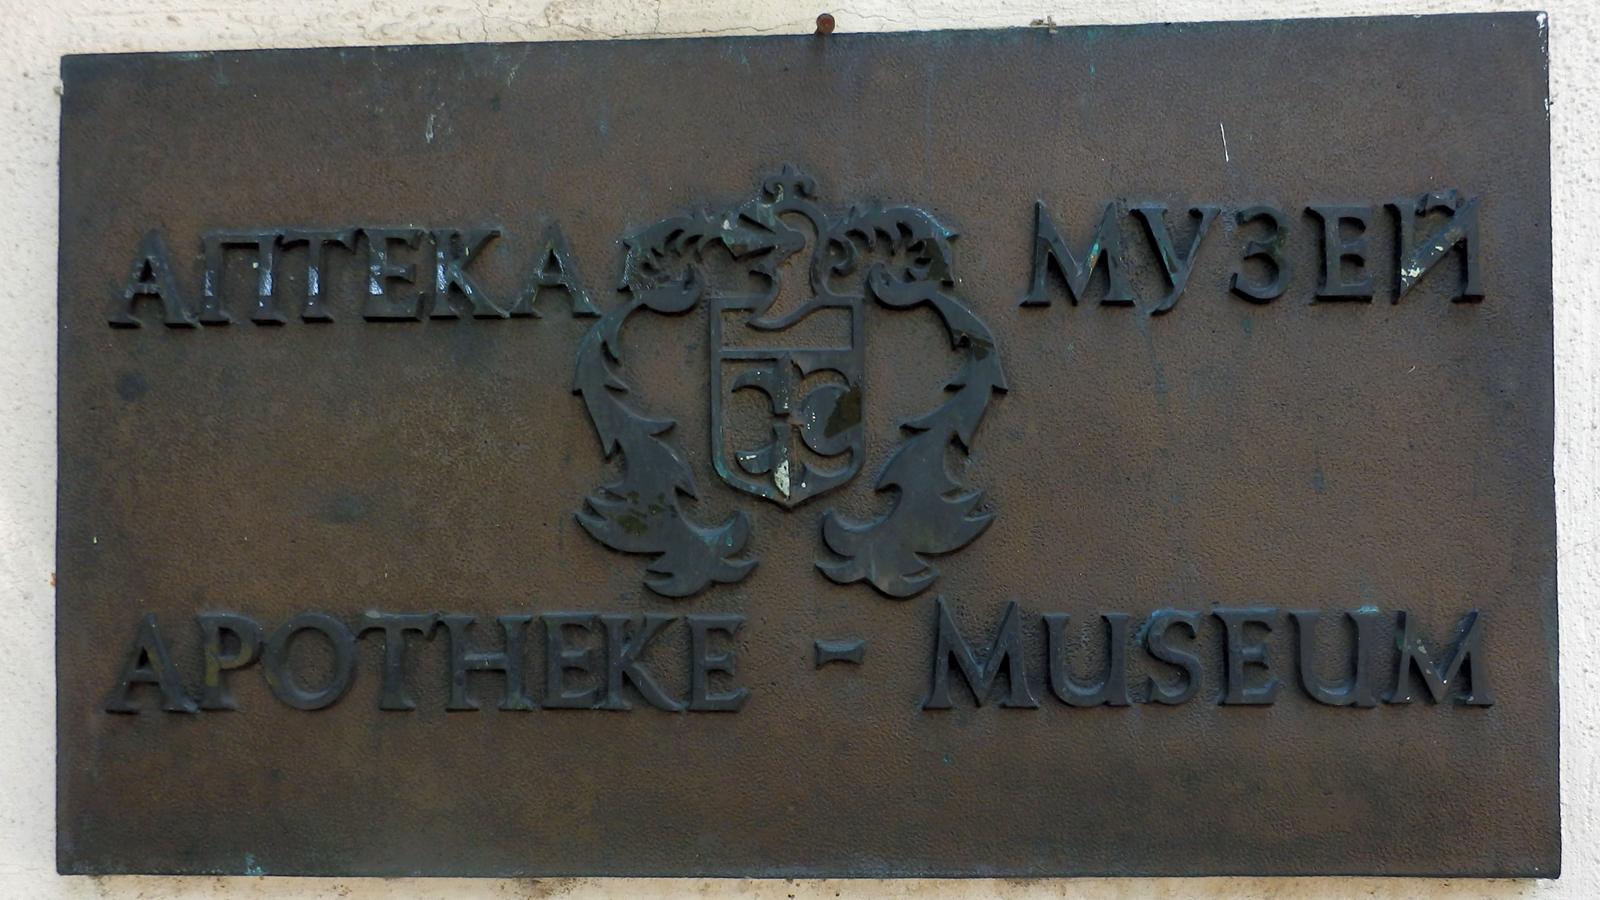 Apotheke-Museum in Kiew